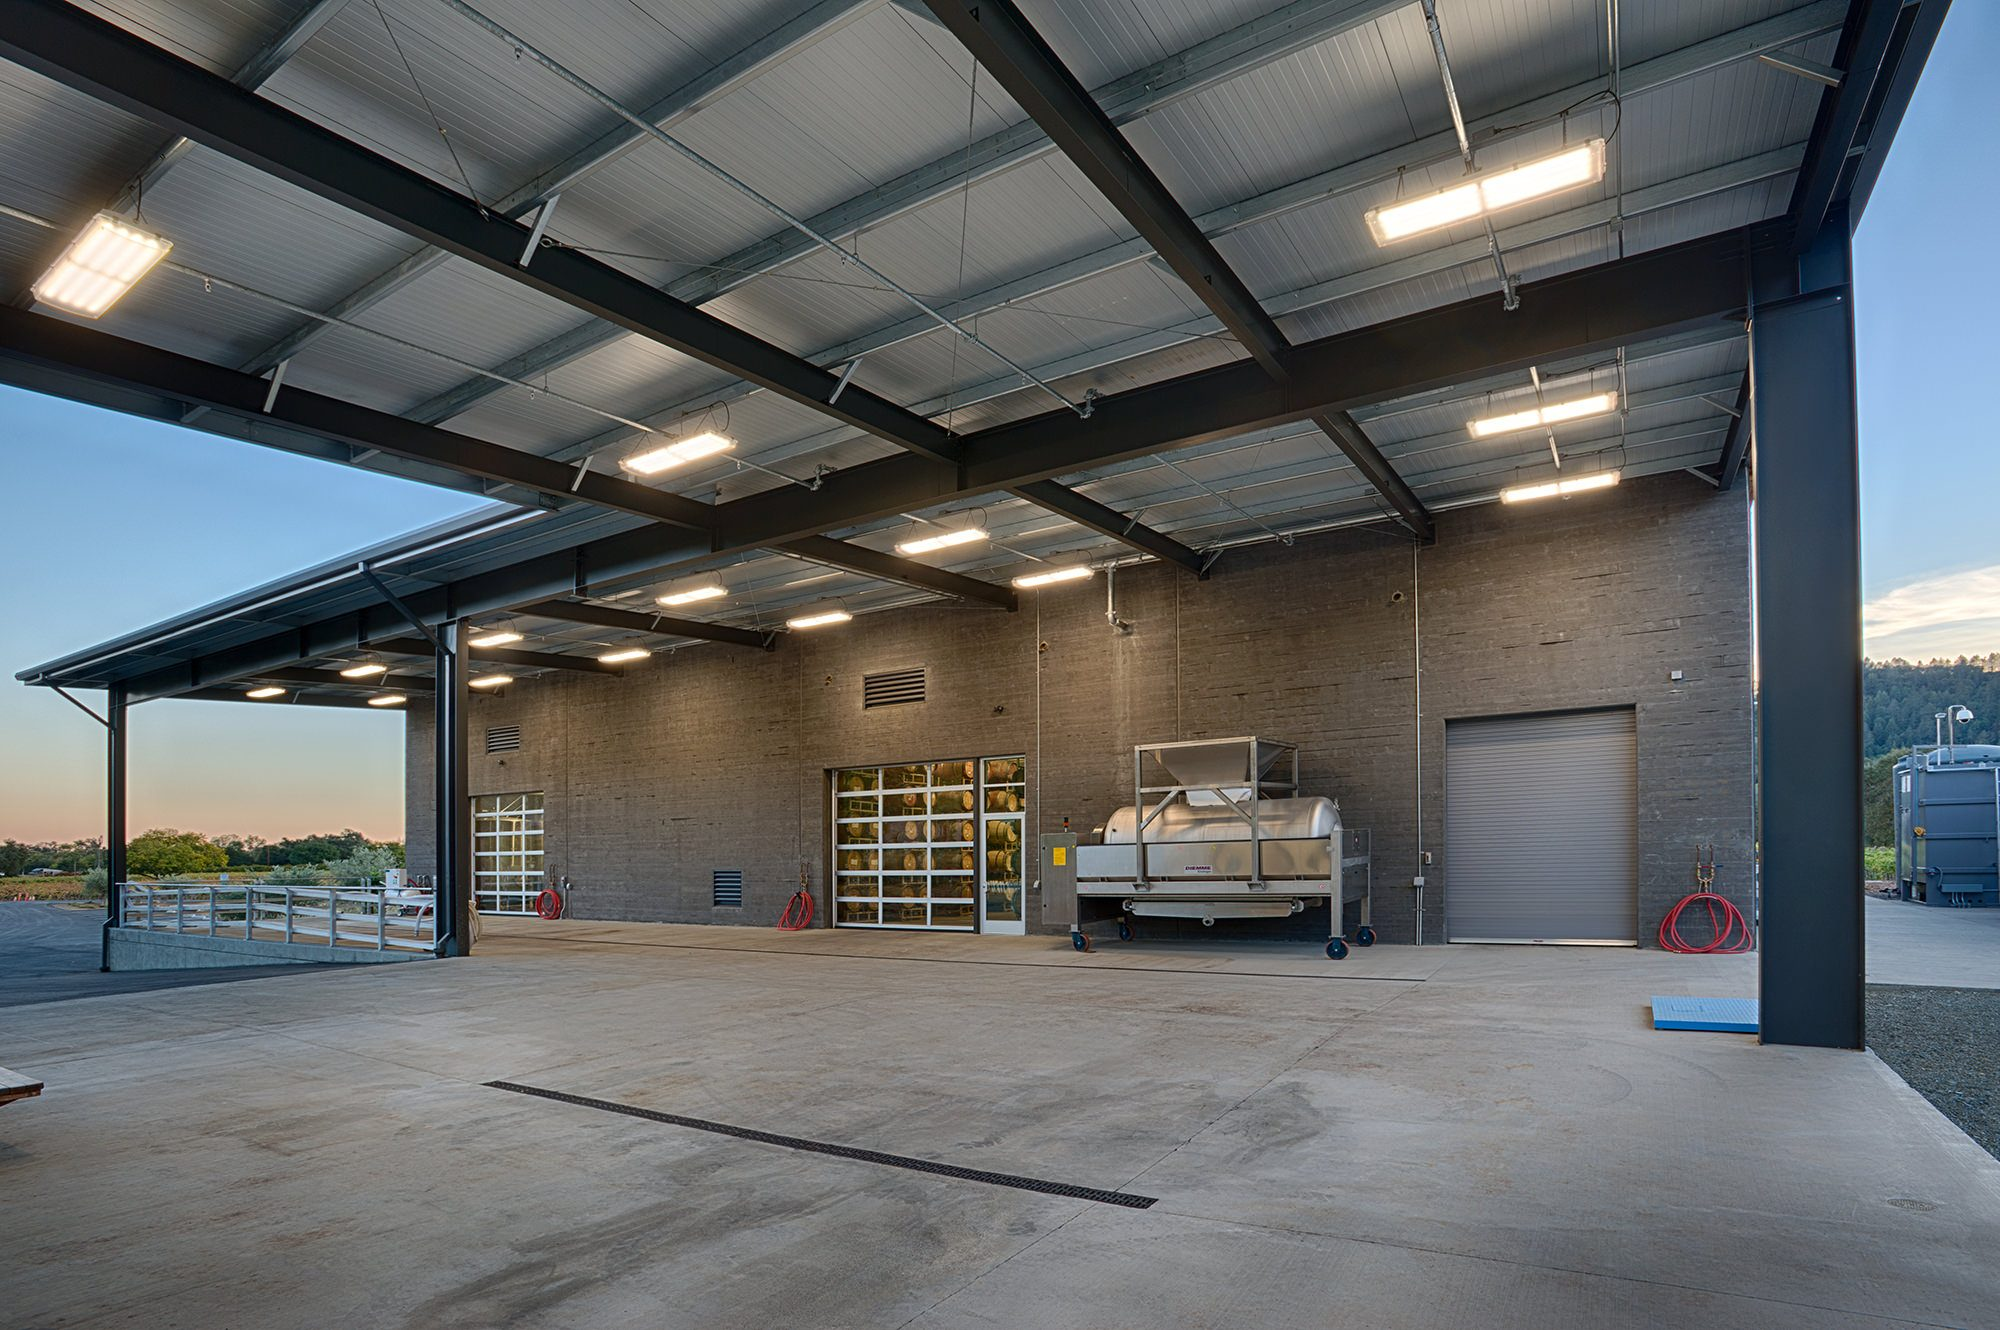 Wine Storage building at Titus Vineyards in Napa Valley